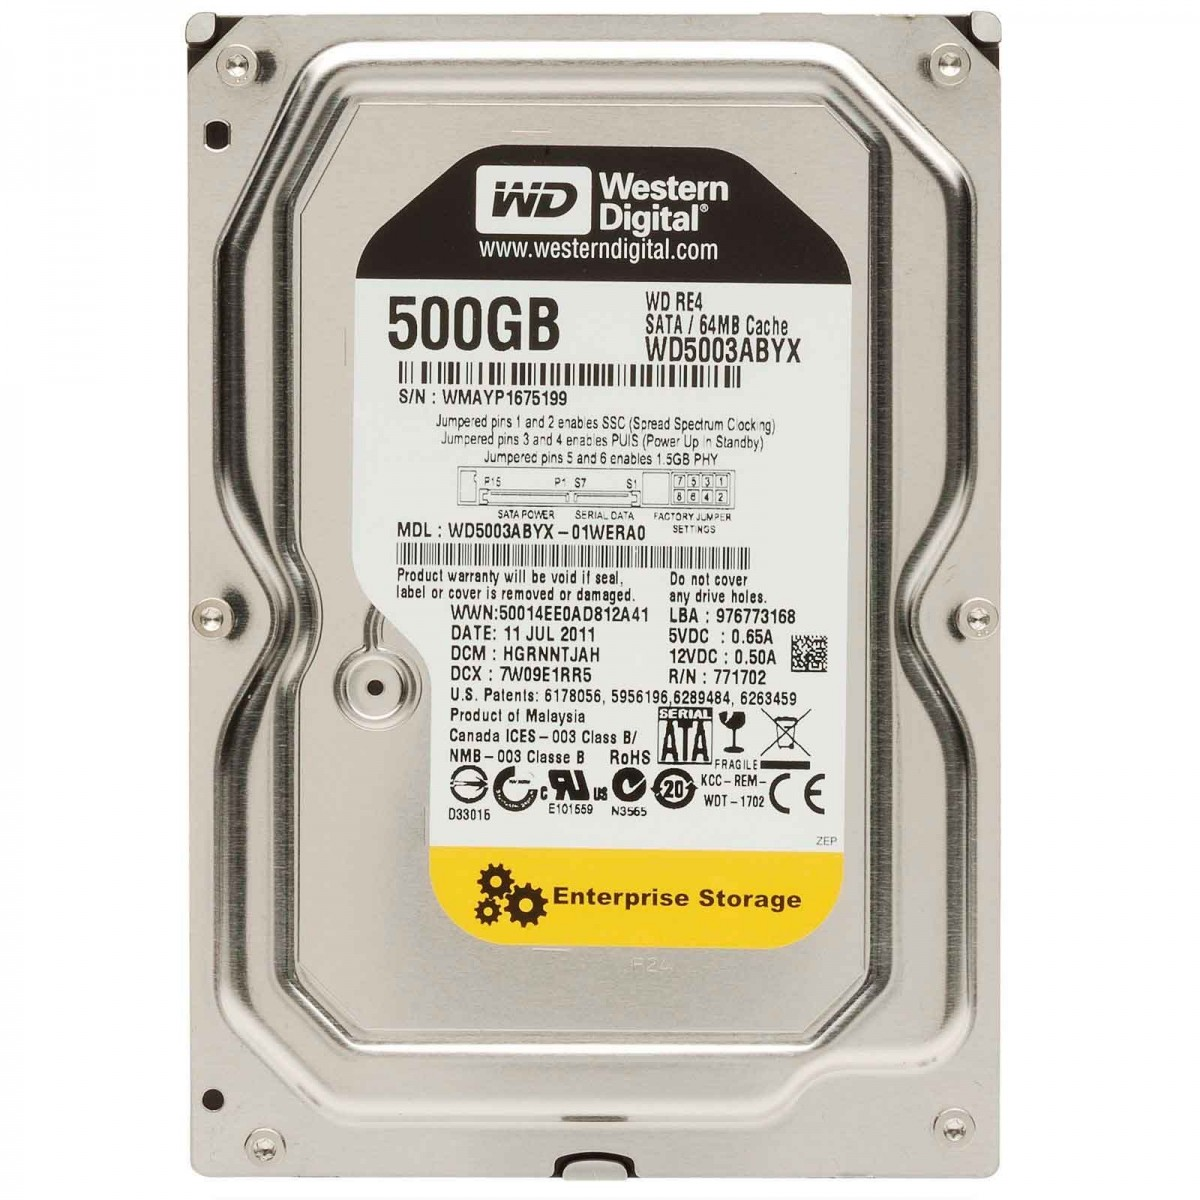 Hd 500Gb Sata3 Wester Digital 7200Rpm Wd5003Abyx